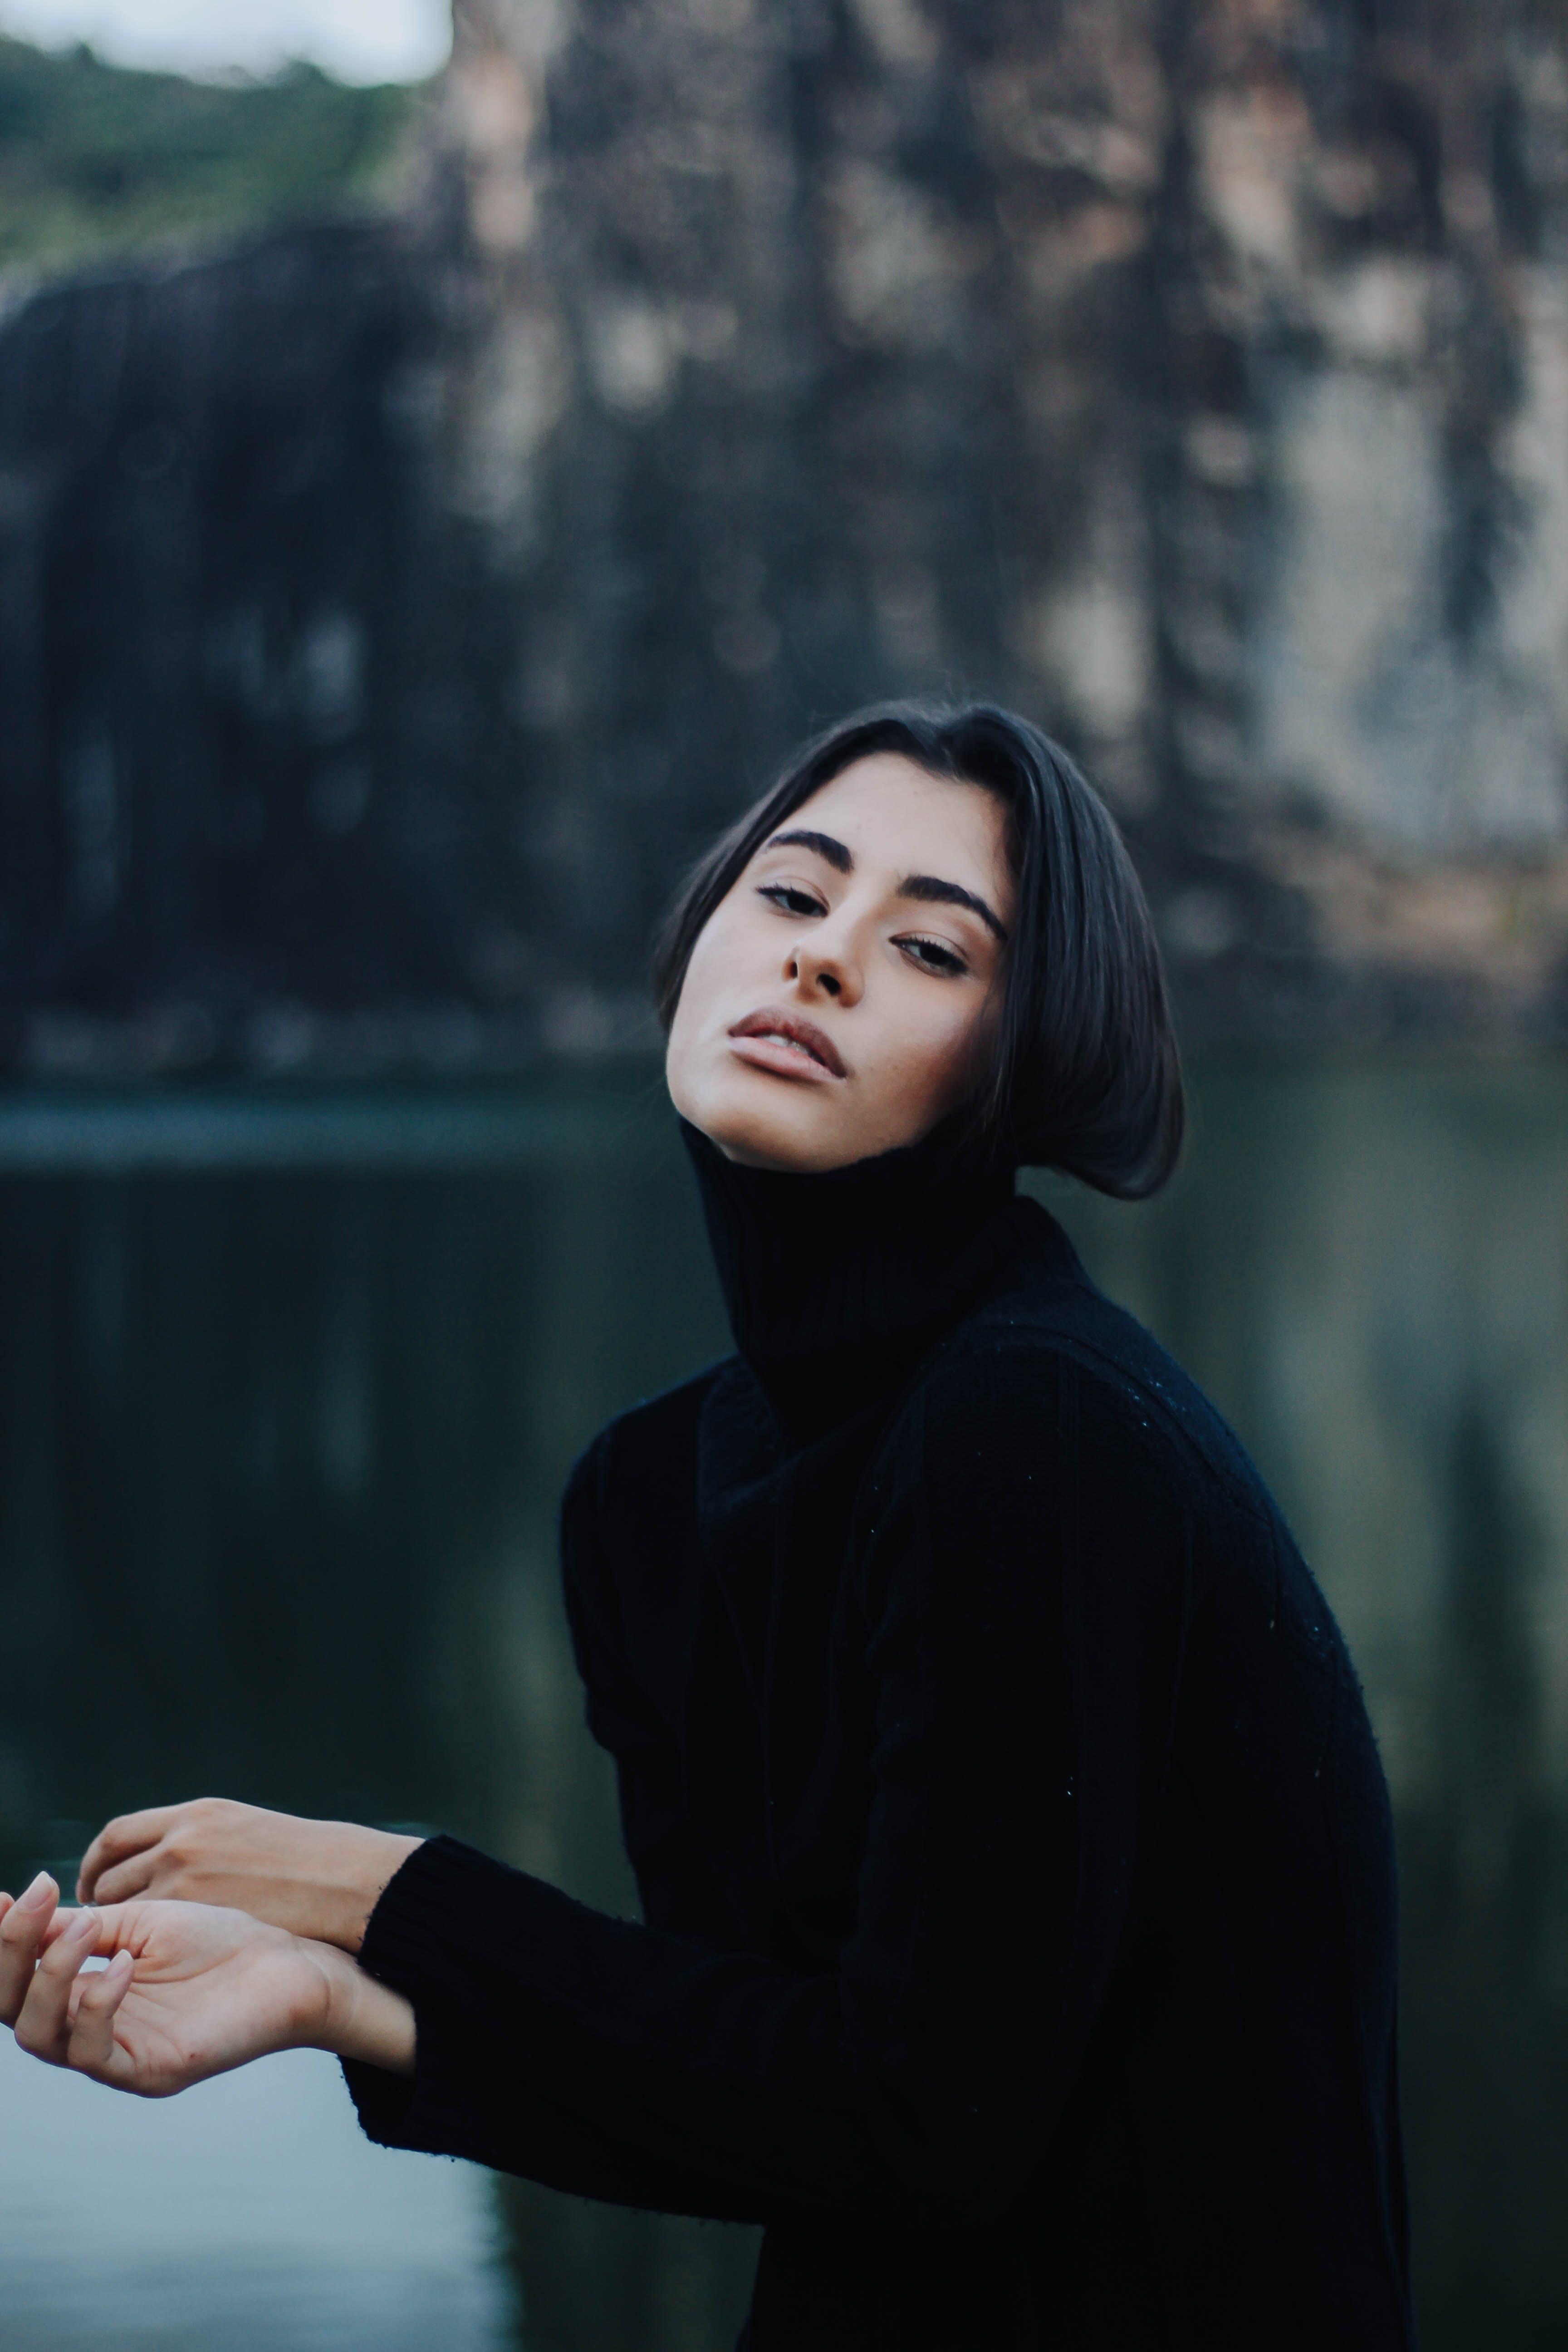 Woman in Black Turtleneck Sweater Standing Near Calm Body of Water